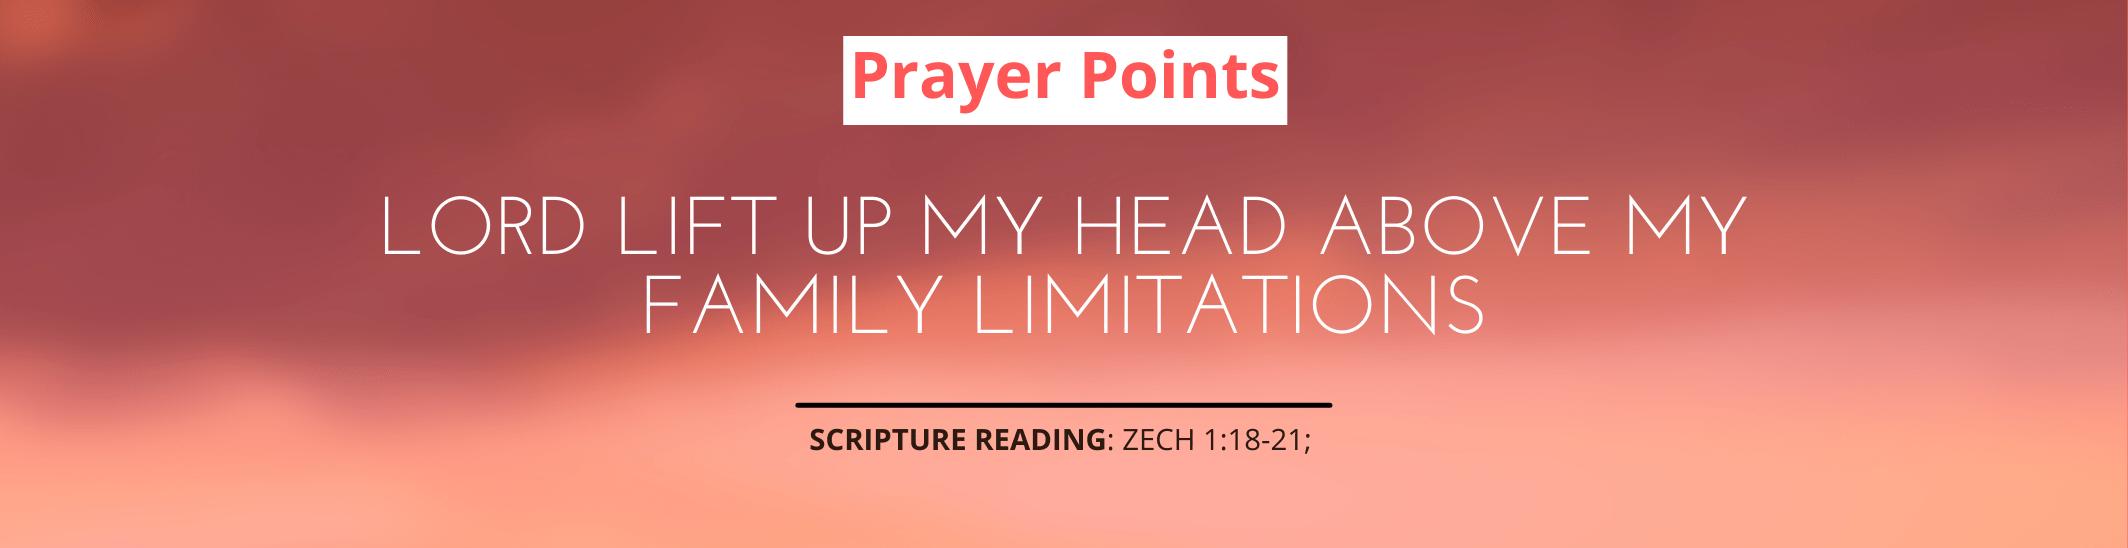 3 Days Fasting & Prayer – Day 2